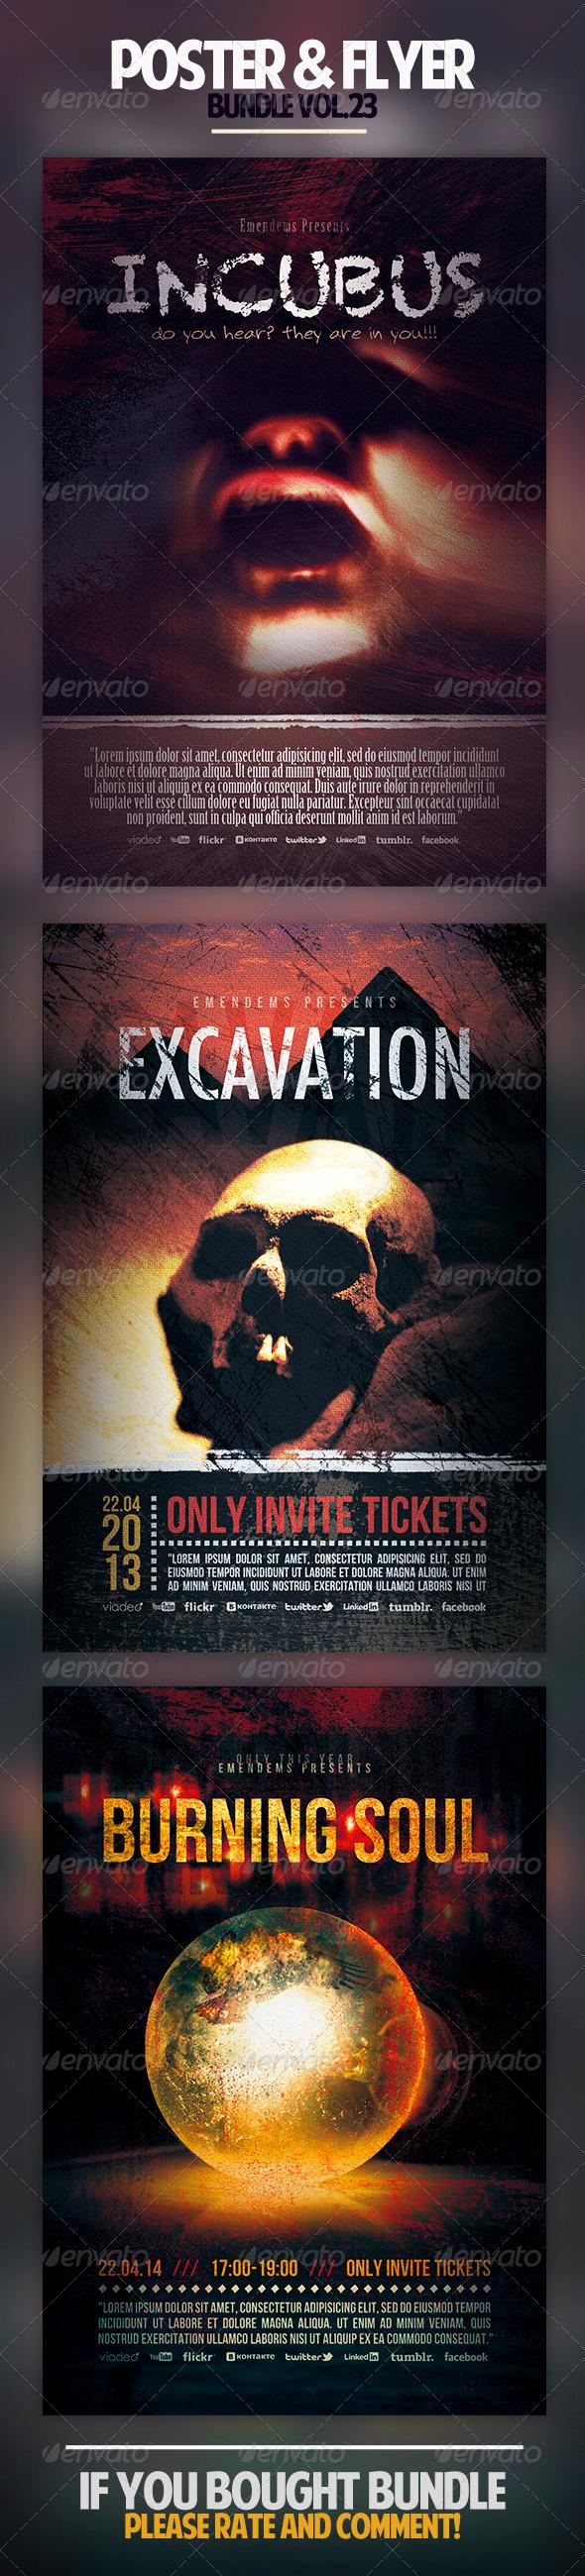 GraphicRiver Poster & Flyer Bundle Vol.23 6994401